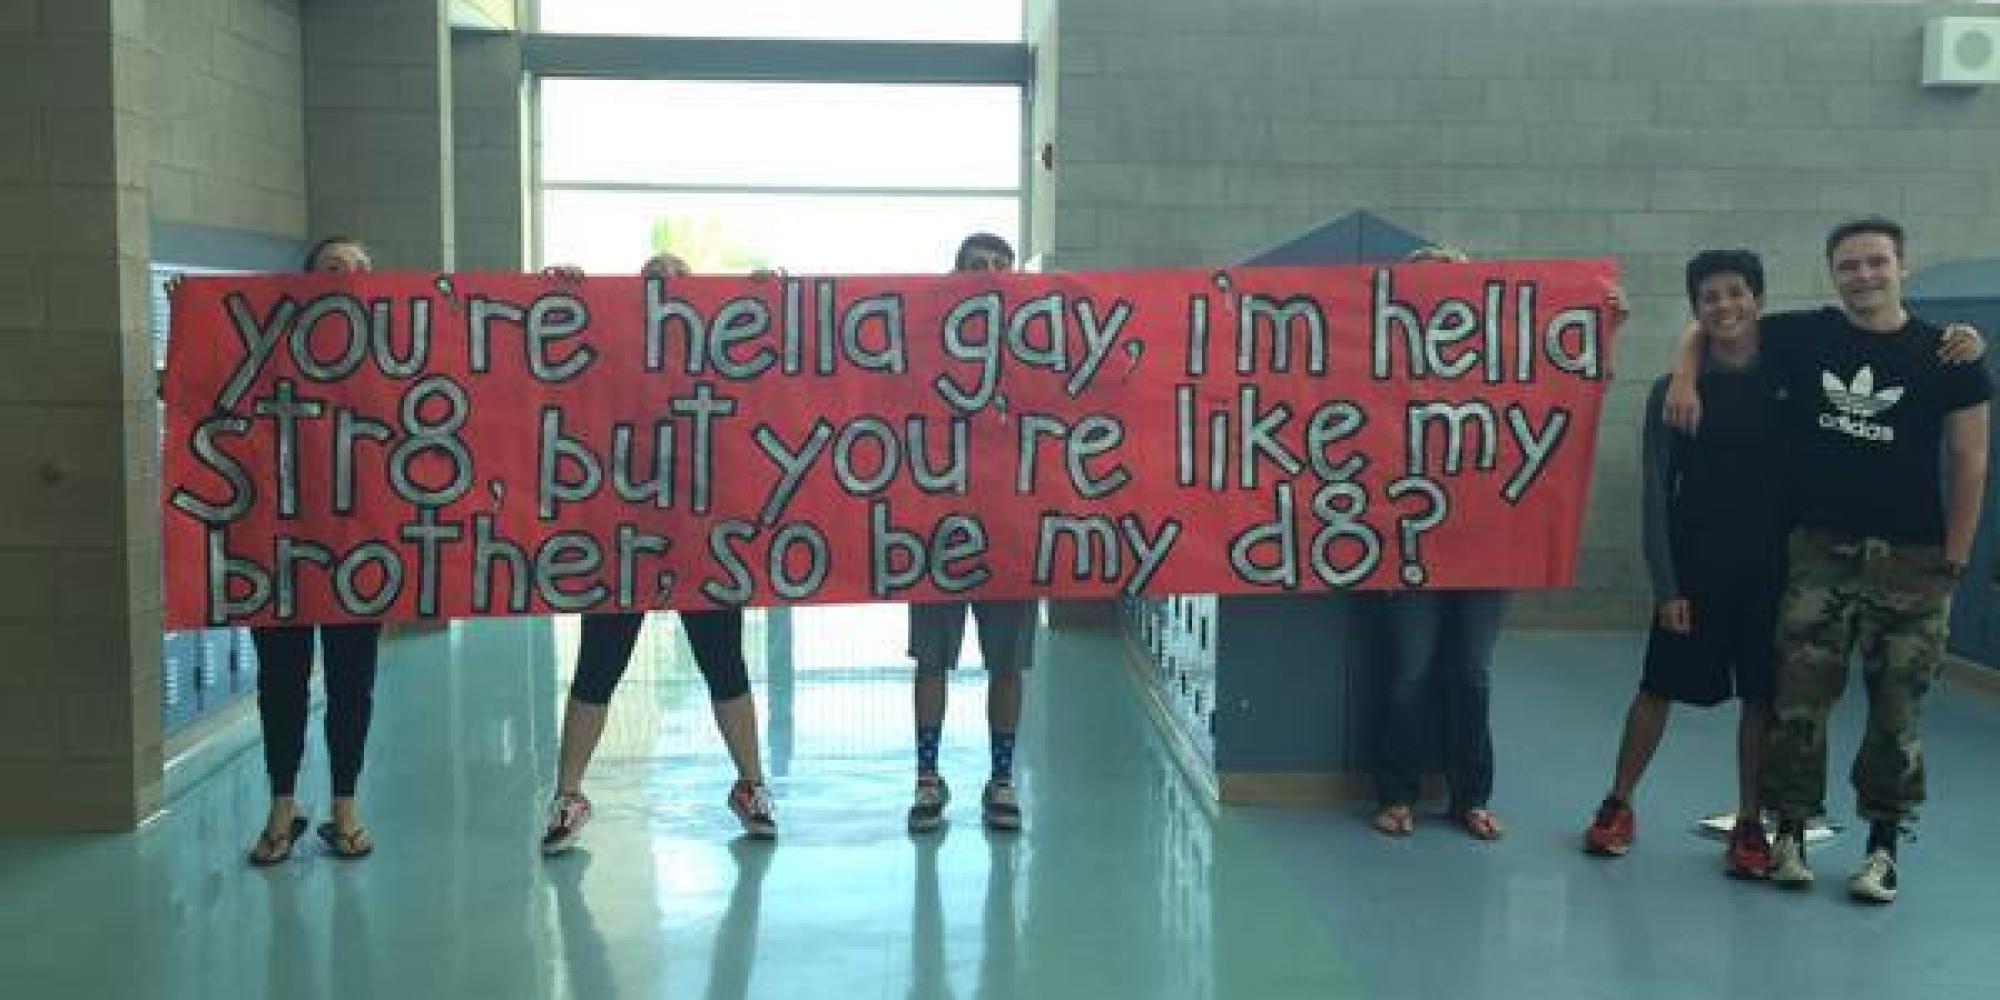 Las Vegas Walmart Reportedly Refuses To Print Gay On